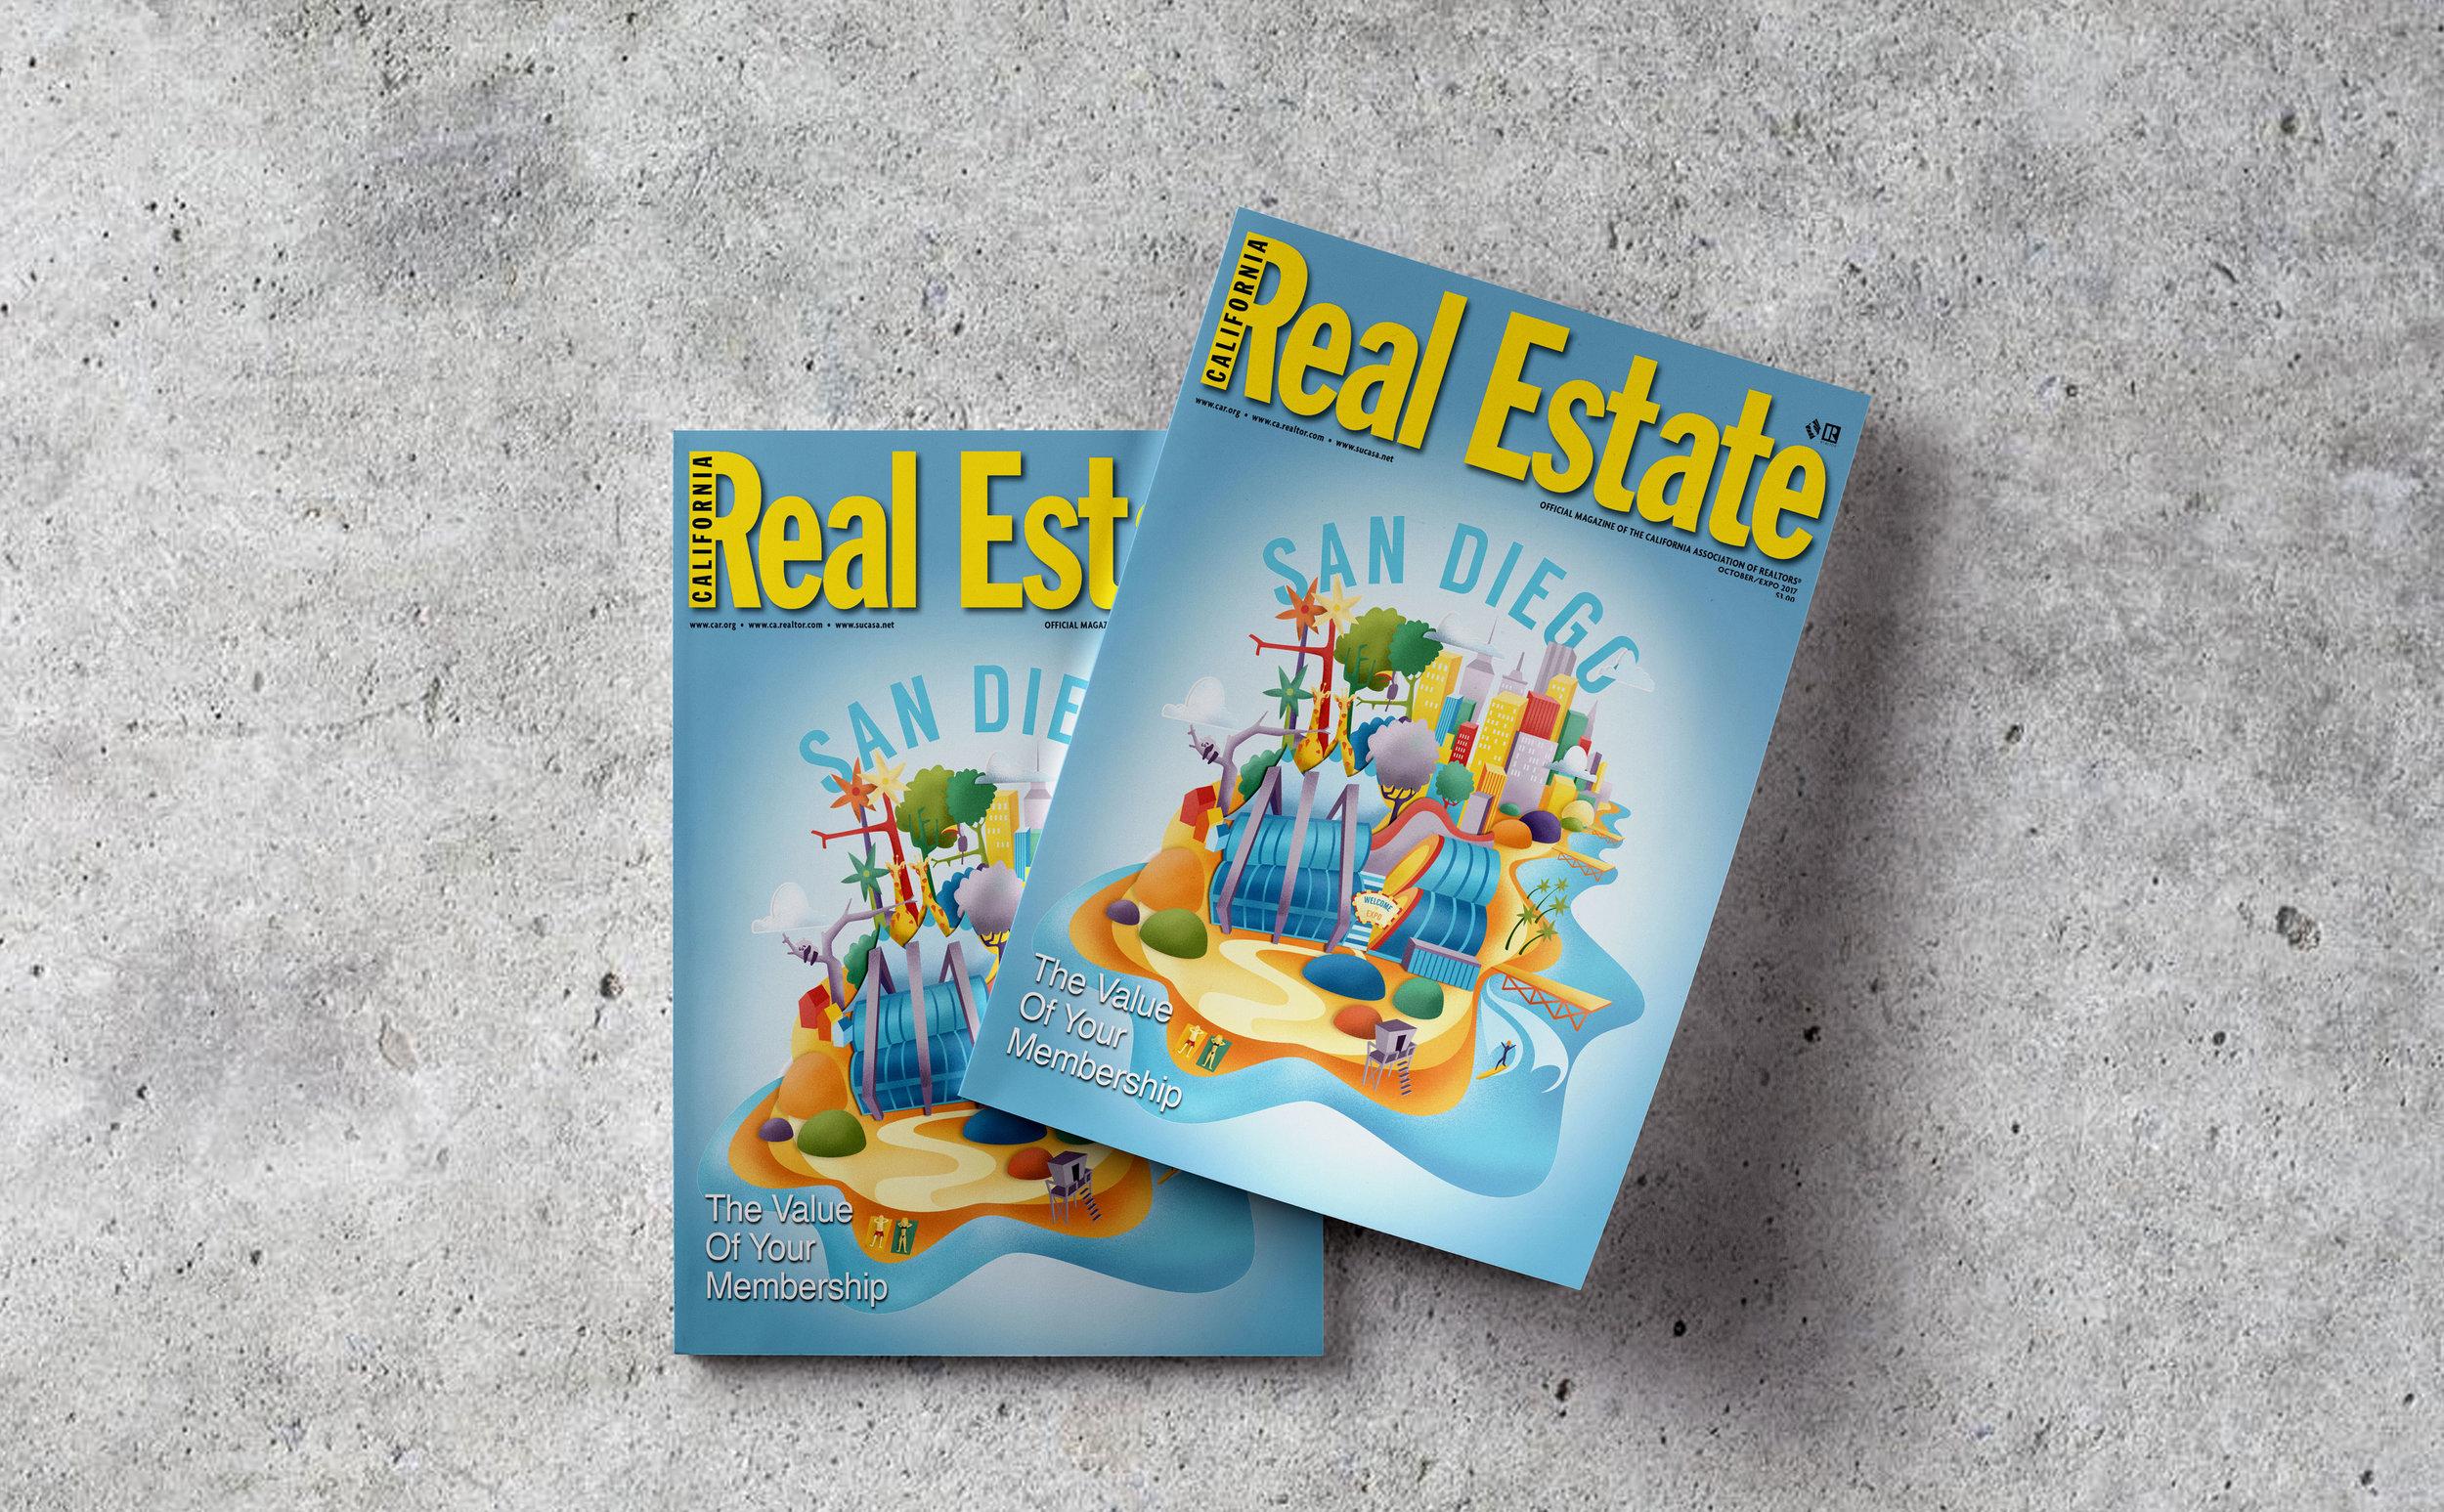 Reddin-Designs-Californian-real-estate-cover1-.jpg